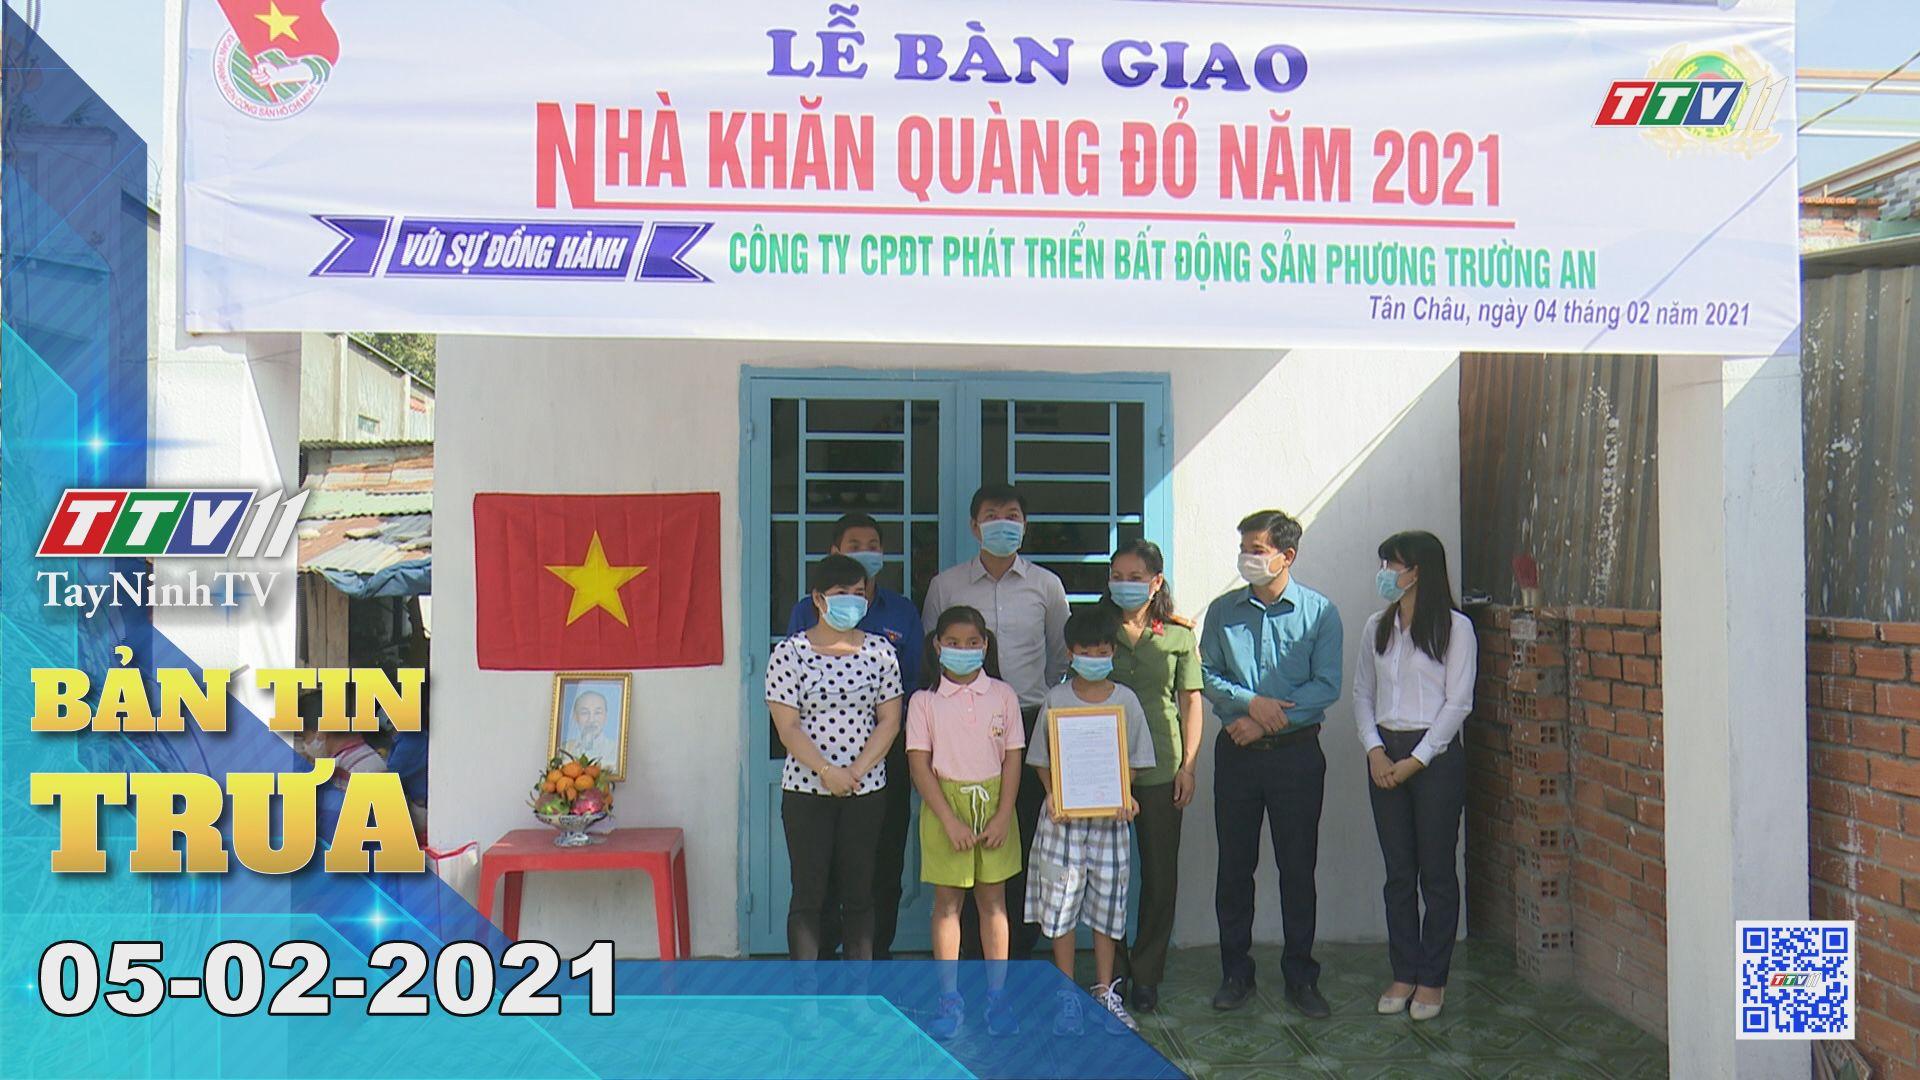 Bản tin trưa 05-02-2021 | Tin tức hôm nay | TayNinhTV